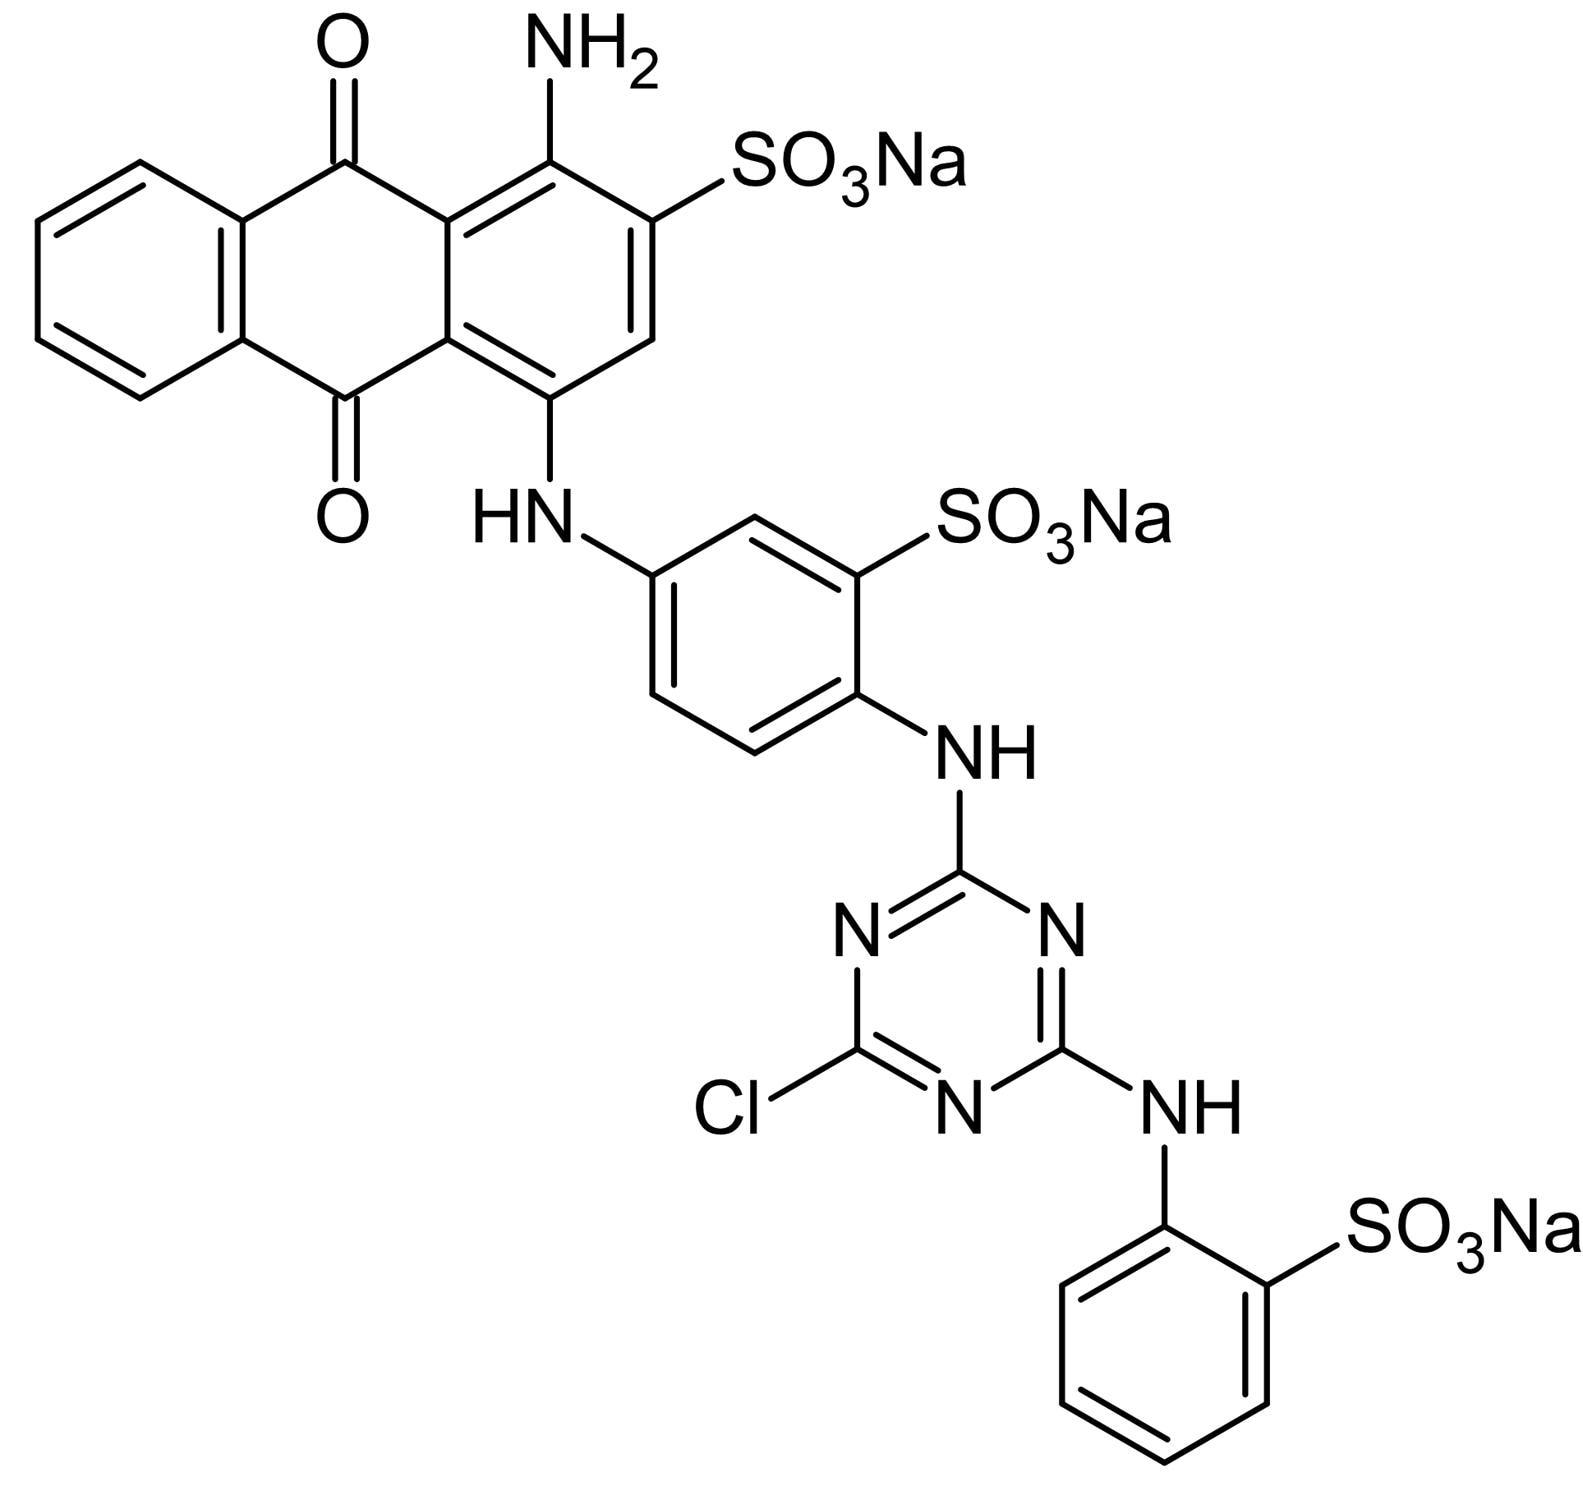 Chemical Structure - Cibacron Blue 3G-A, Anthraquinone derivative dye (ab141504)